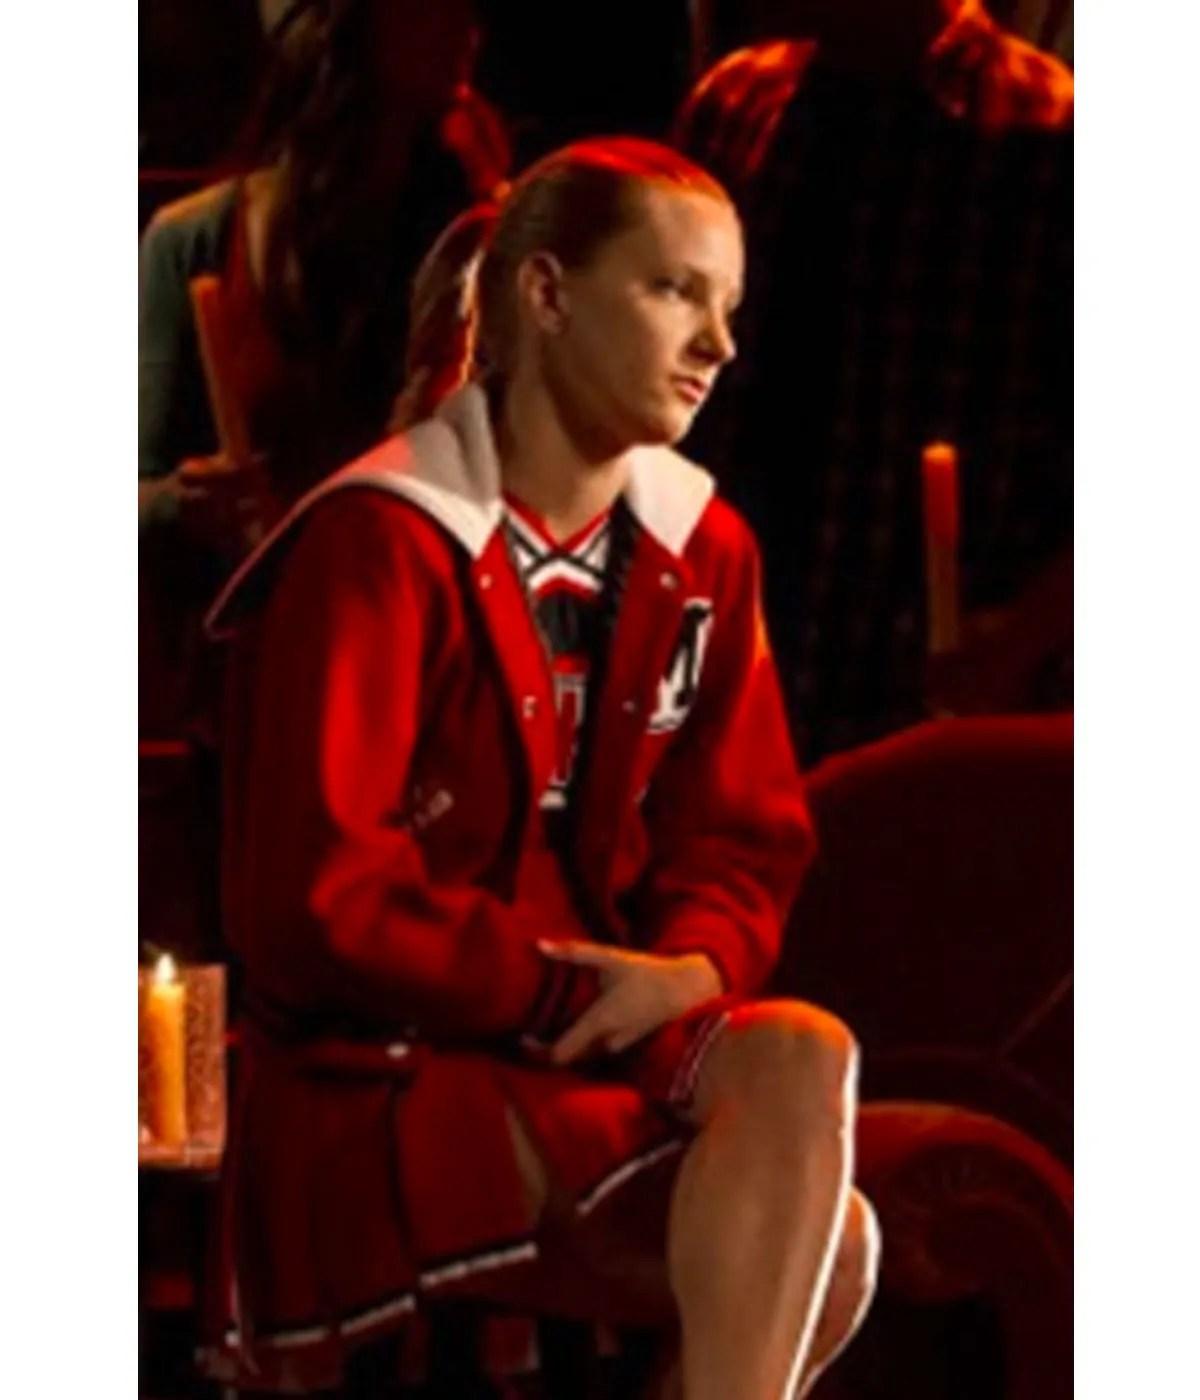 brittany-pierce-glee-cheerleading-cheerios-varsity-jacket